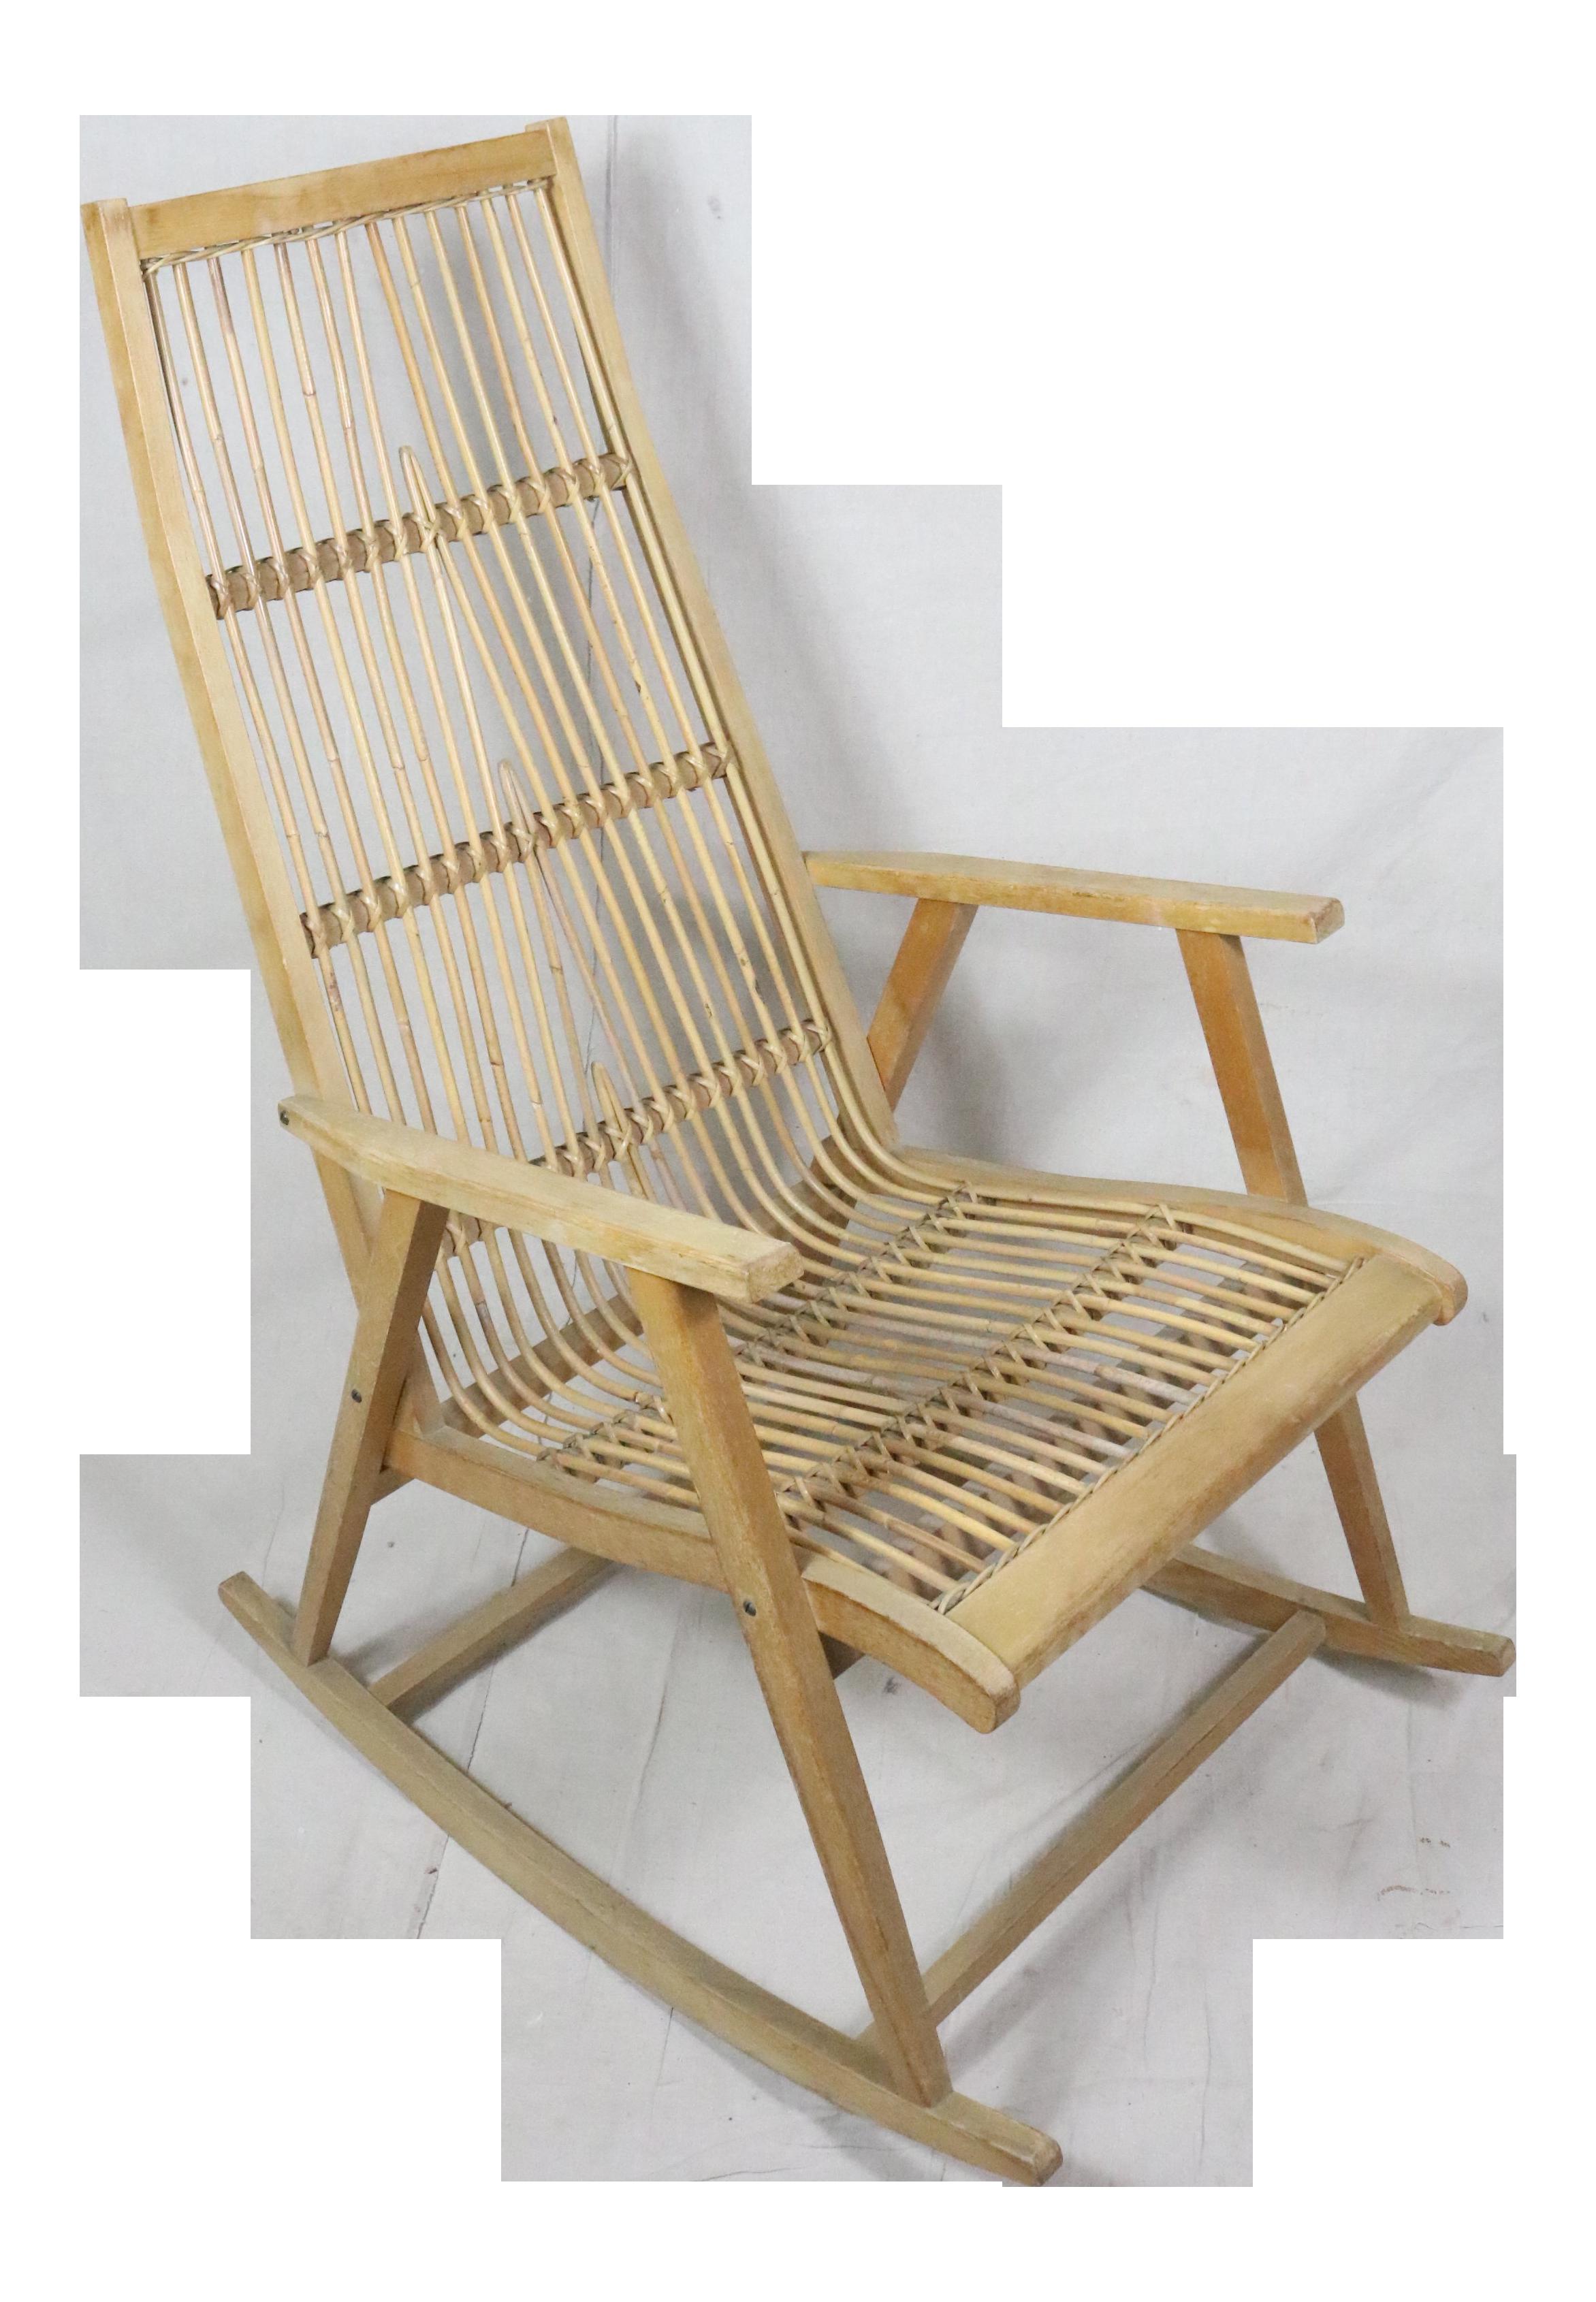 Vintage Mid Century Scandinavian Rattan Rocking Chair For Sale  sc 1 st  Chairish & Vintage u0026 Used Rocking Chairs for Sale | Chairish